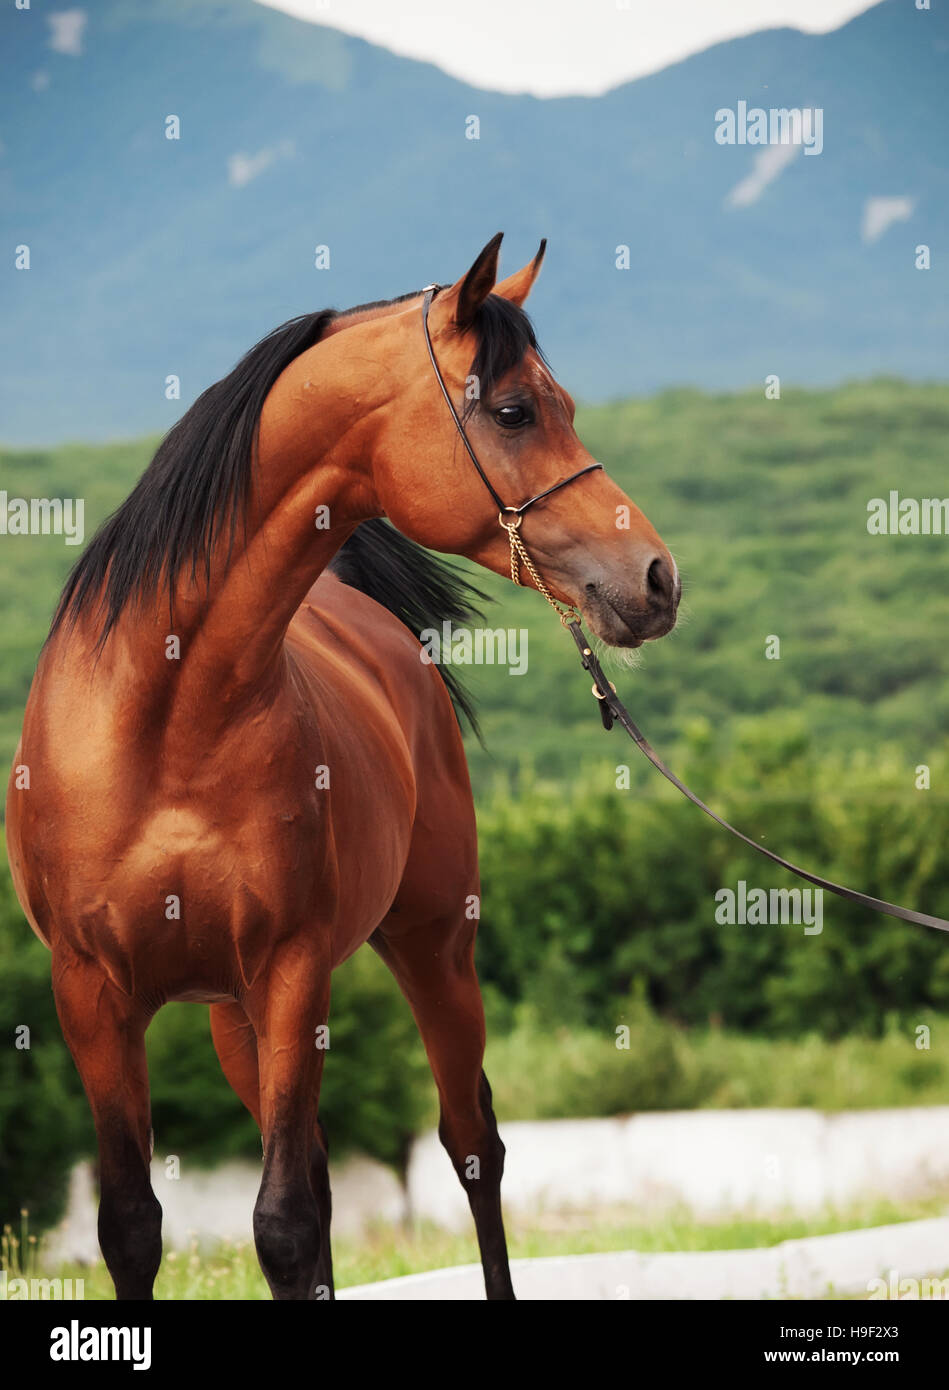 Retrato de bahía arabian stallion en fondo de montaña Foto de stock